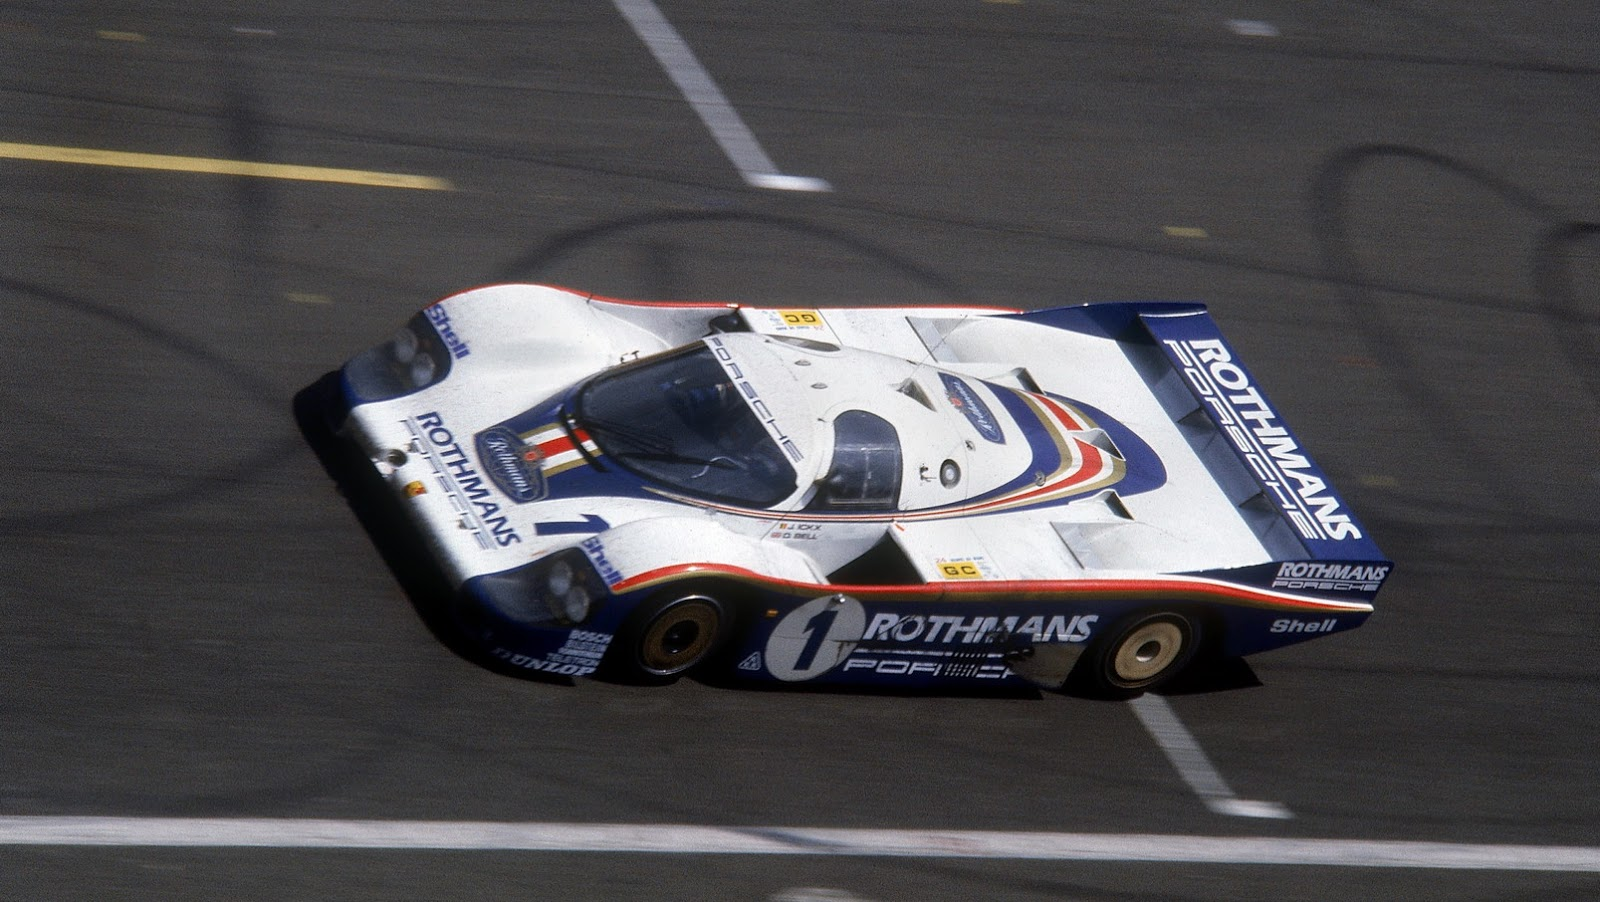 Porsche Macan Classic Racing Liveries (5)